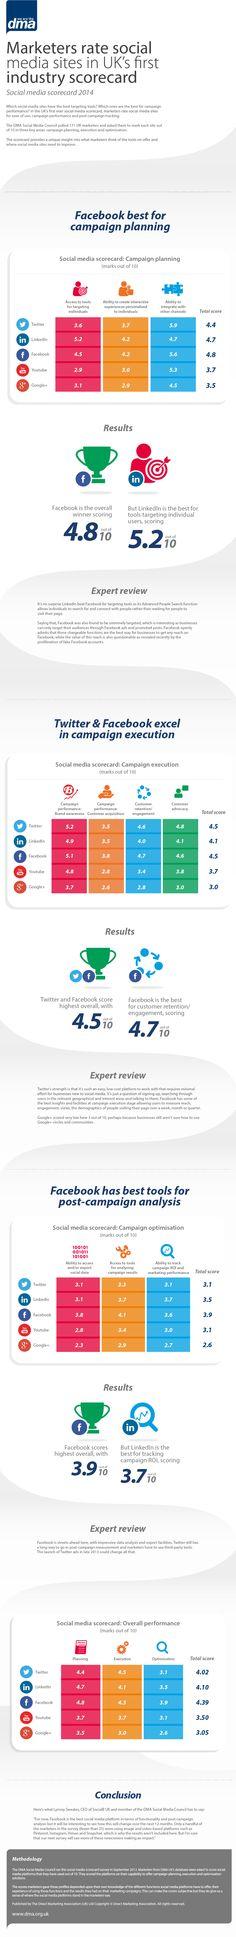 "Infographic - Social Media Scorecard 2014 - Facebook ""most marketing friendly"" social platform,"